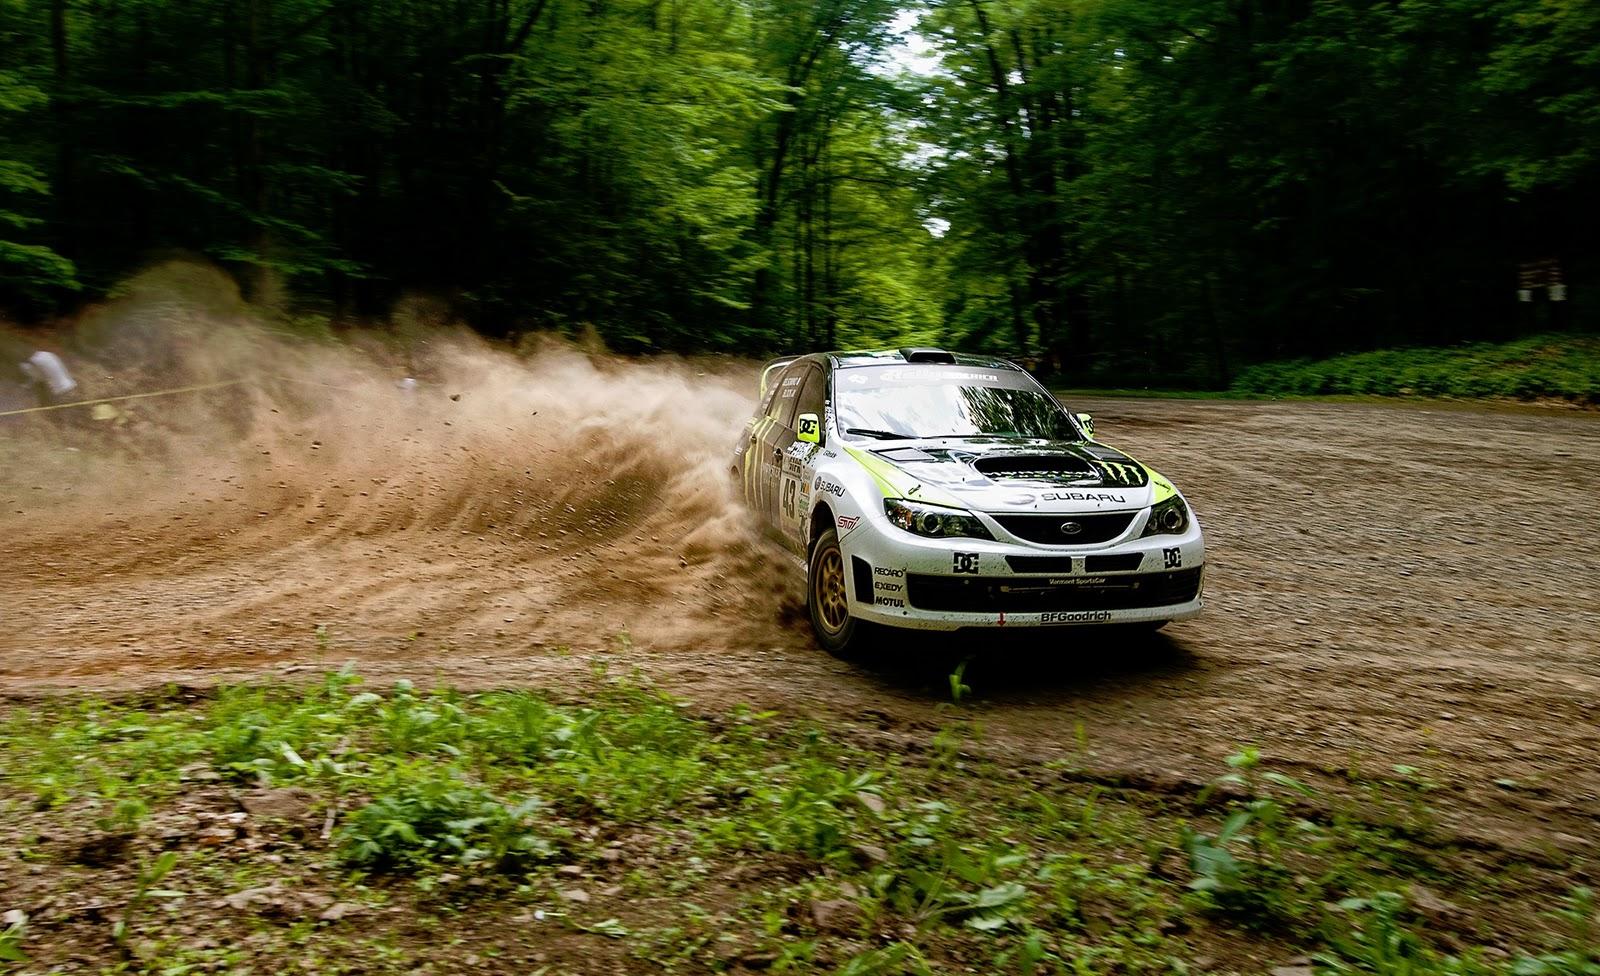 http://1.bp.blogspot.com/_2UbsSBz9ckE/TTZDiR9WGUI/AAAAAAAABbc/emgLE2w9Jyk/s1600/Ken+Block+Subaru+Impretza+STi+Raceing.jpg